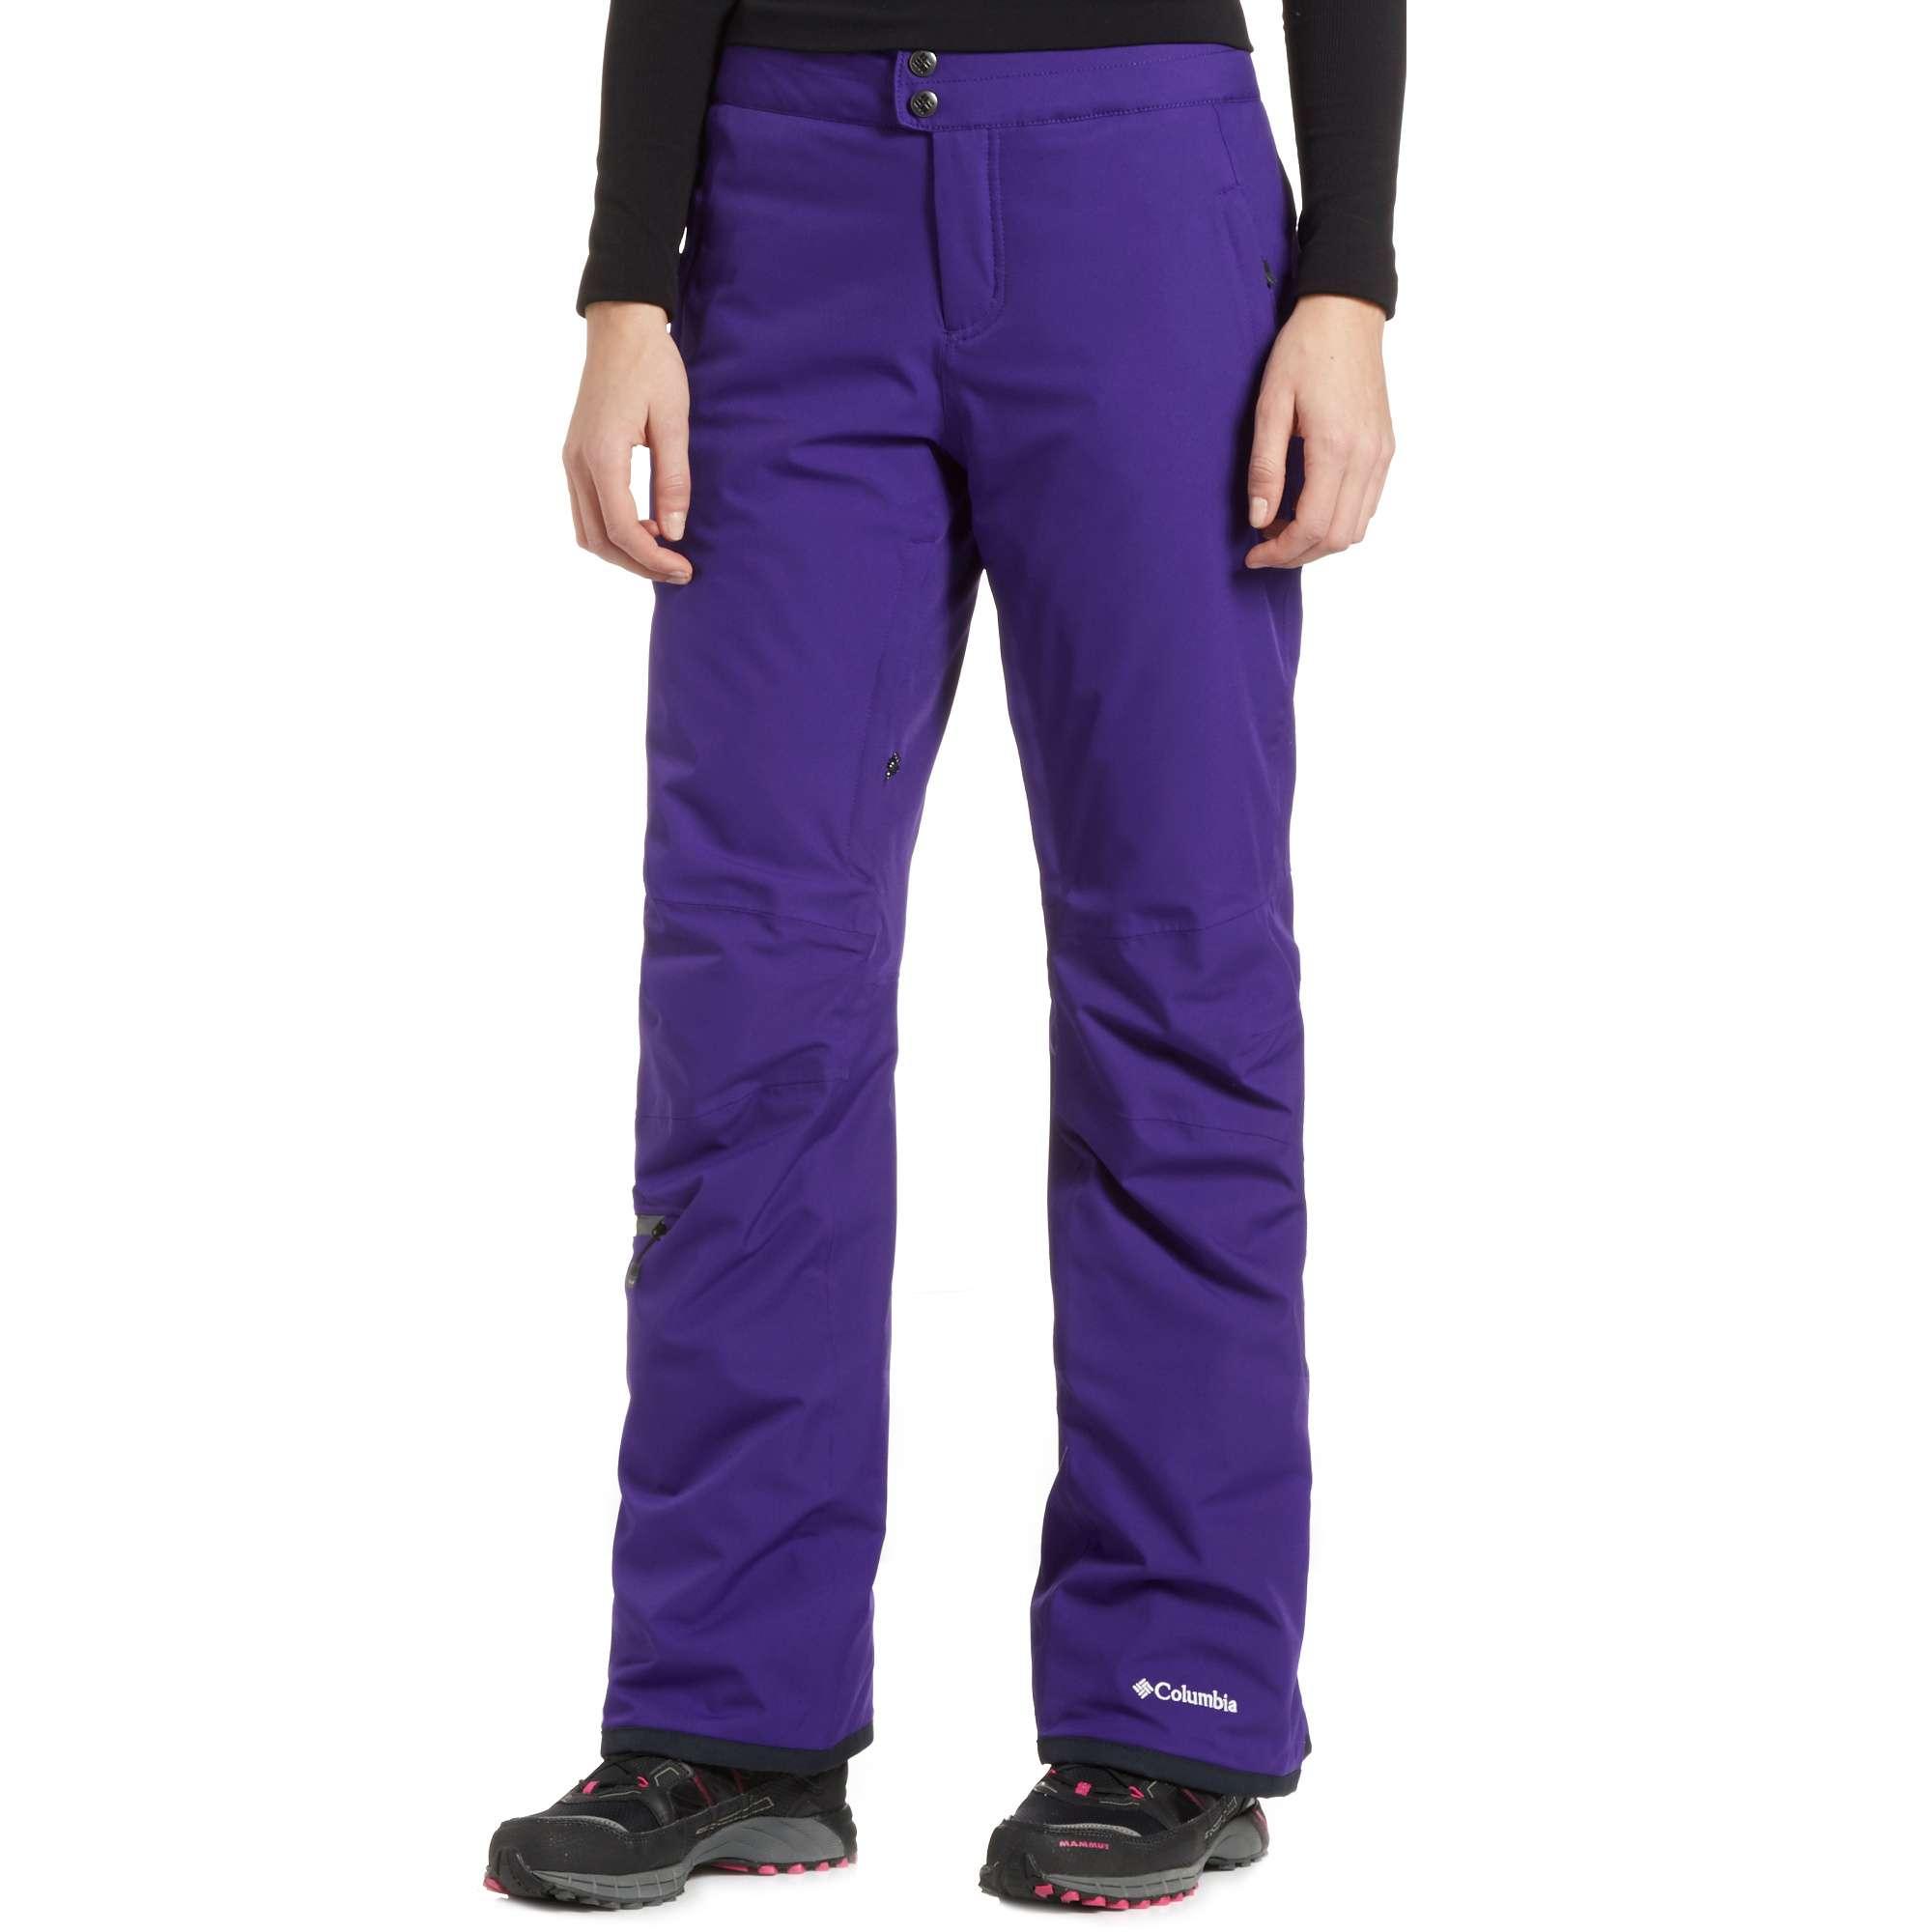 COLUMBIA Women's Veloca Vixen Ski Trousers